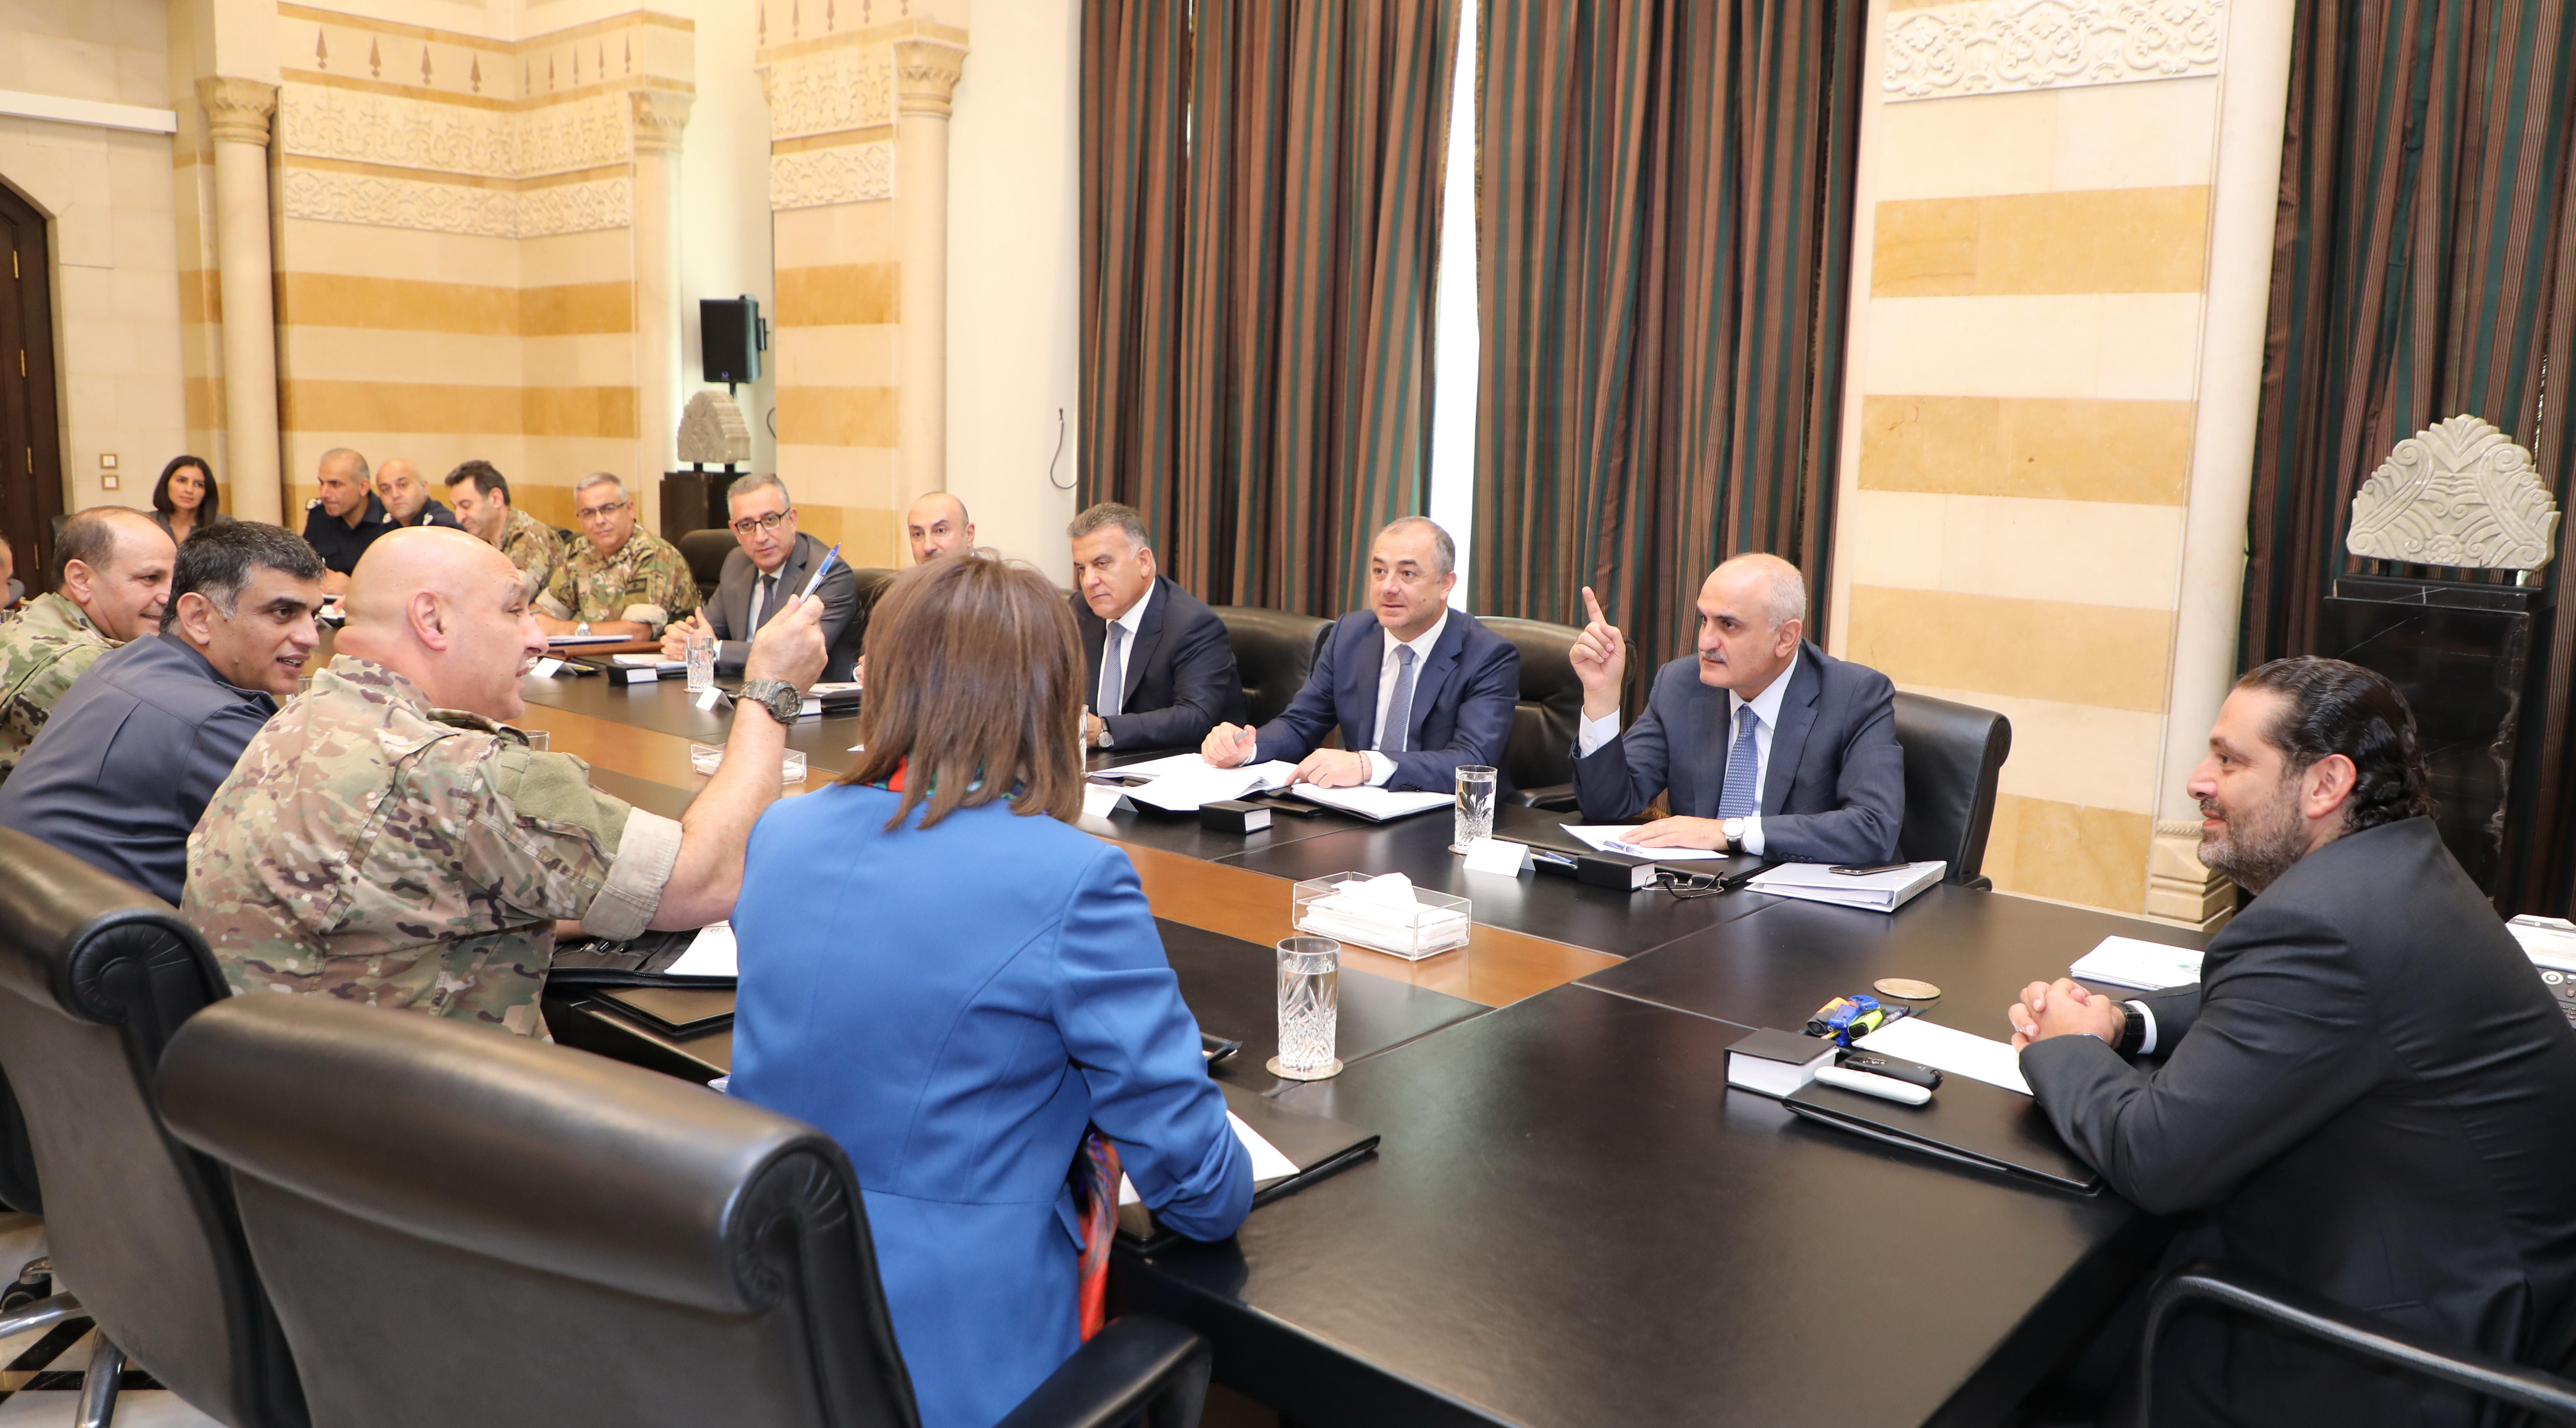 Pr Miinister Saad Hariri meets Luxenburg Deputy Pr Minister 3